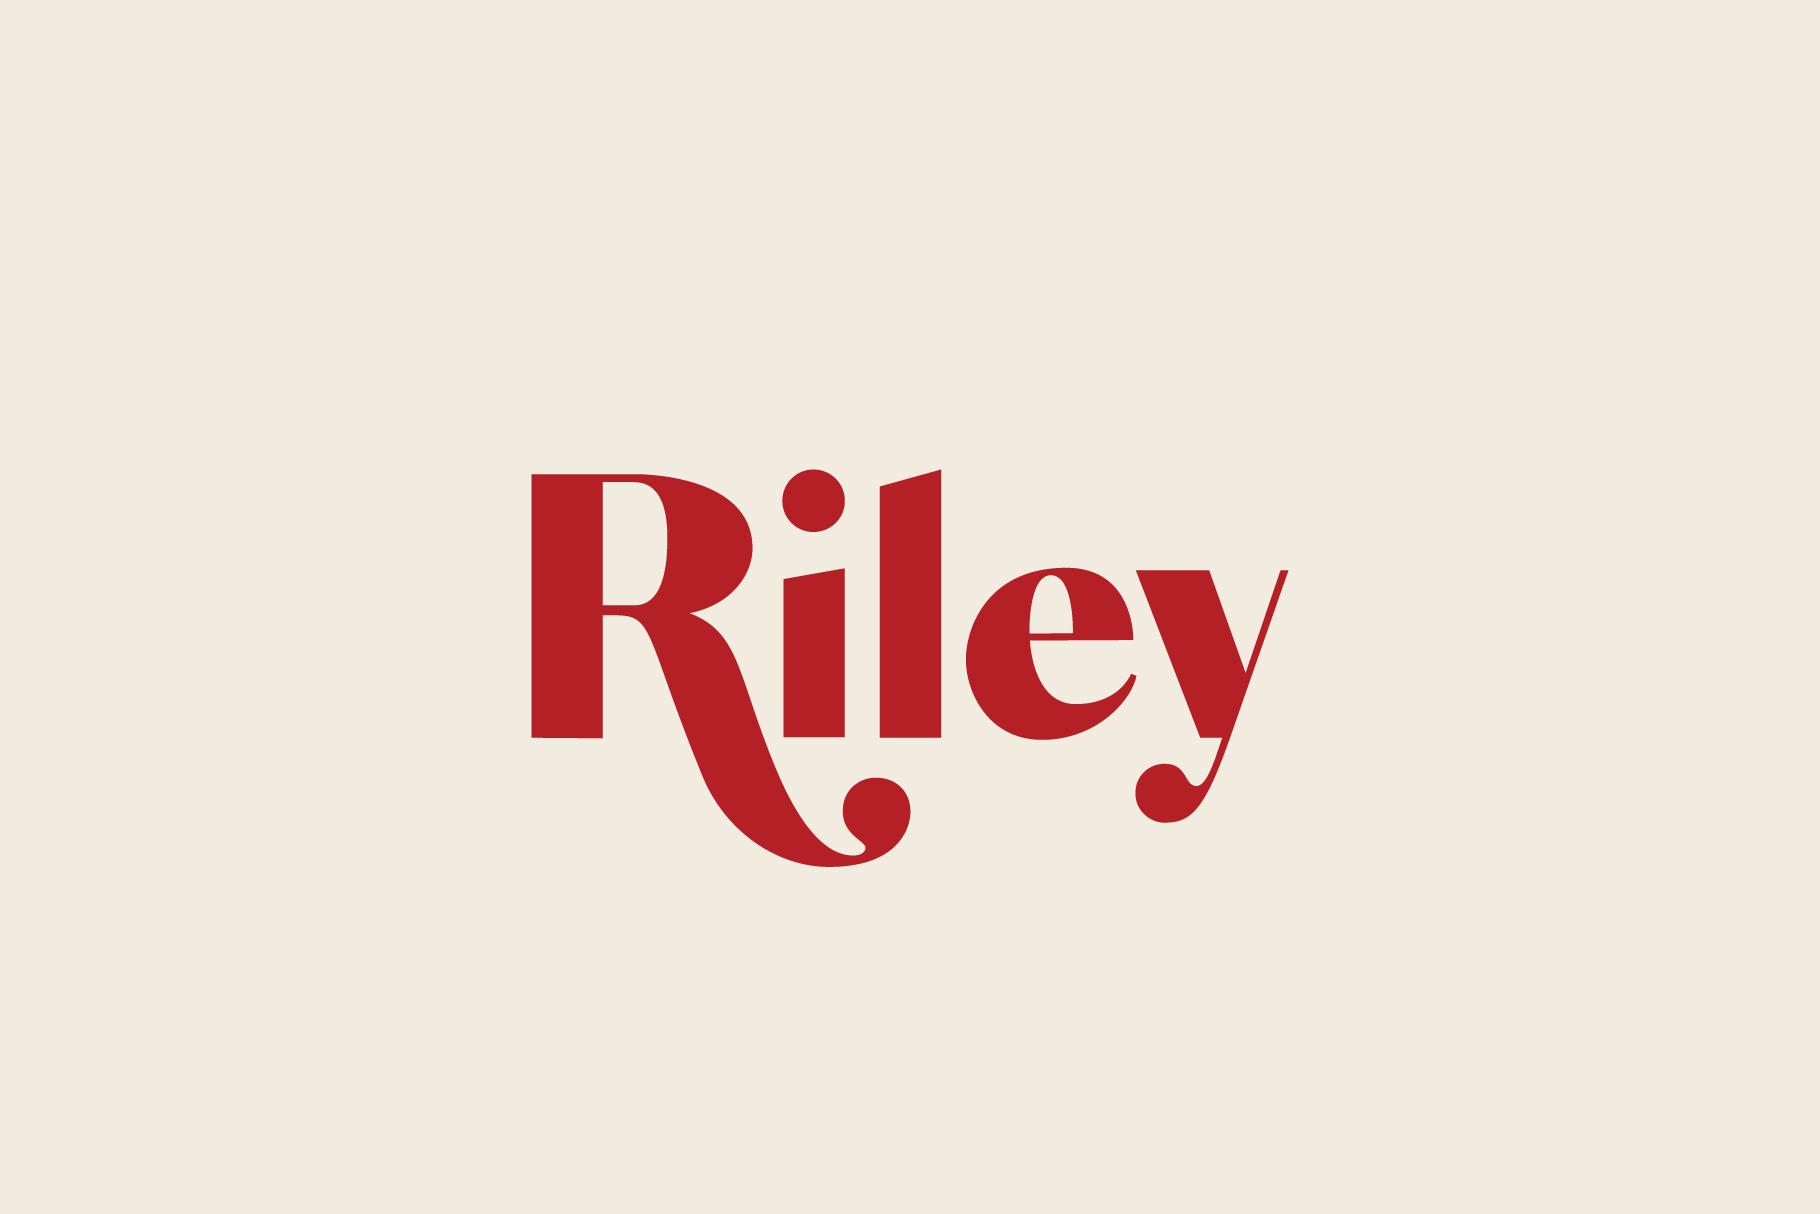 Riley A Modern Typeface Josh Ownby